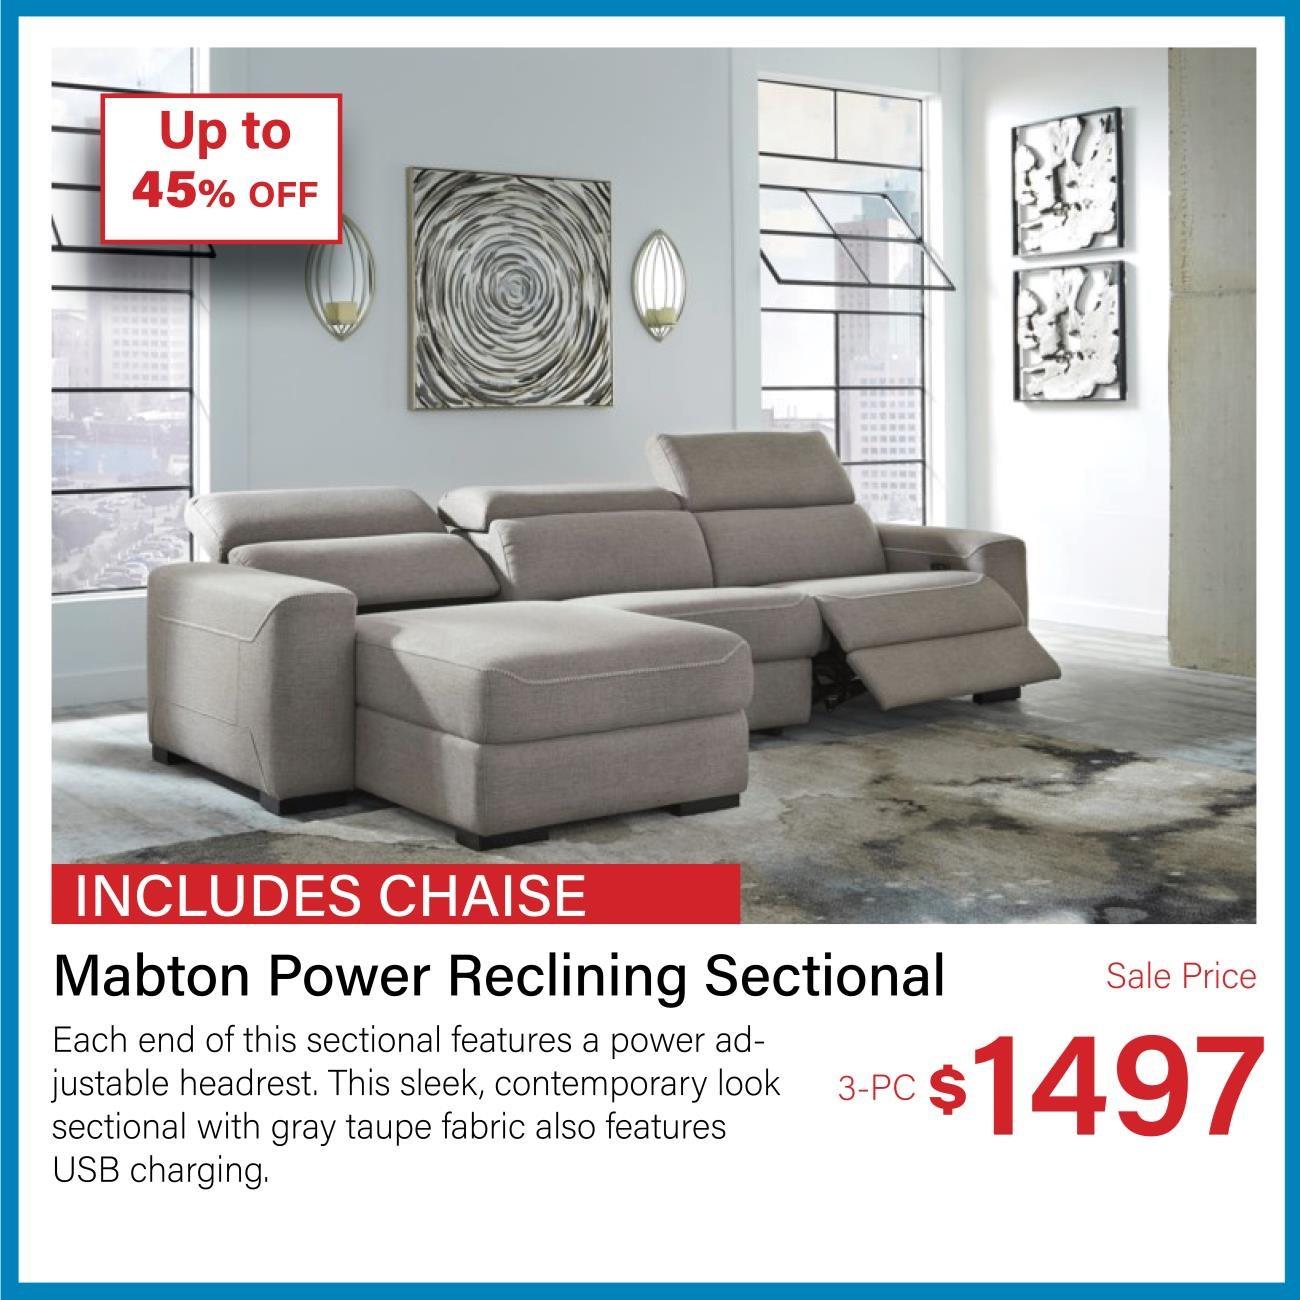 mabton power reclining sectional